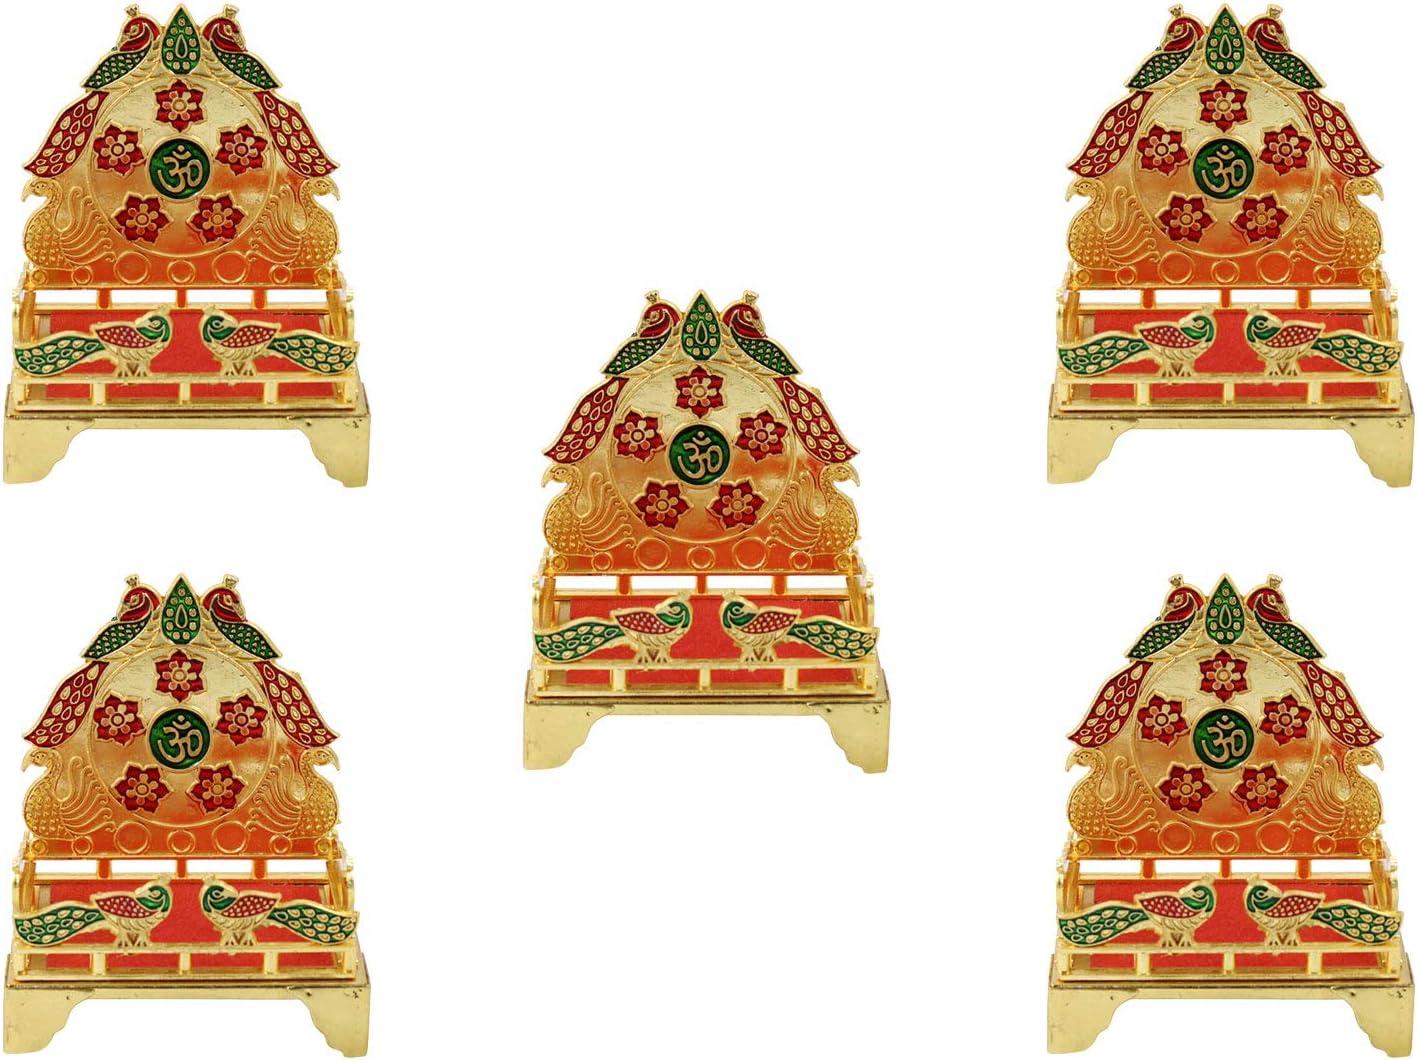 GoldGiftIdeas Gold Plated Peacock Shape Laddu Gopal Singhasan for Pooja, Singhasan for God Idols, Return Gifts for Housewarming, Pooja Items for Pooja Room (Pack of 5)